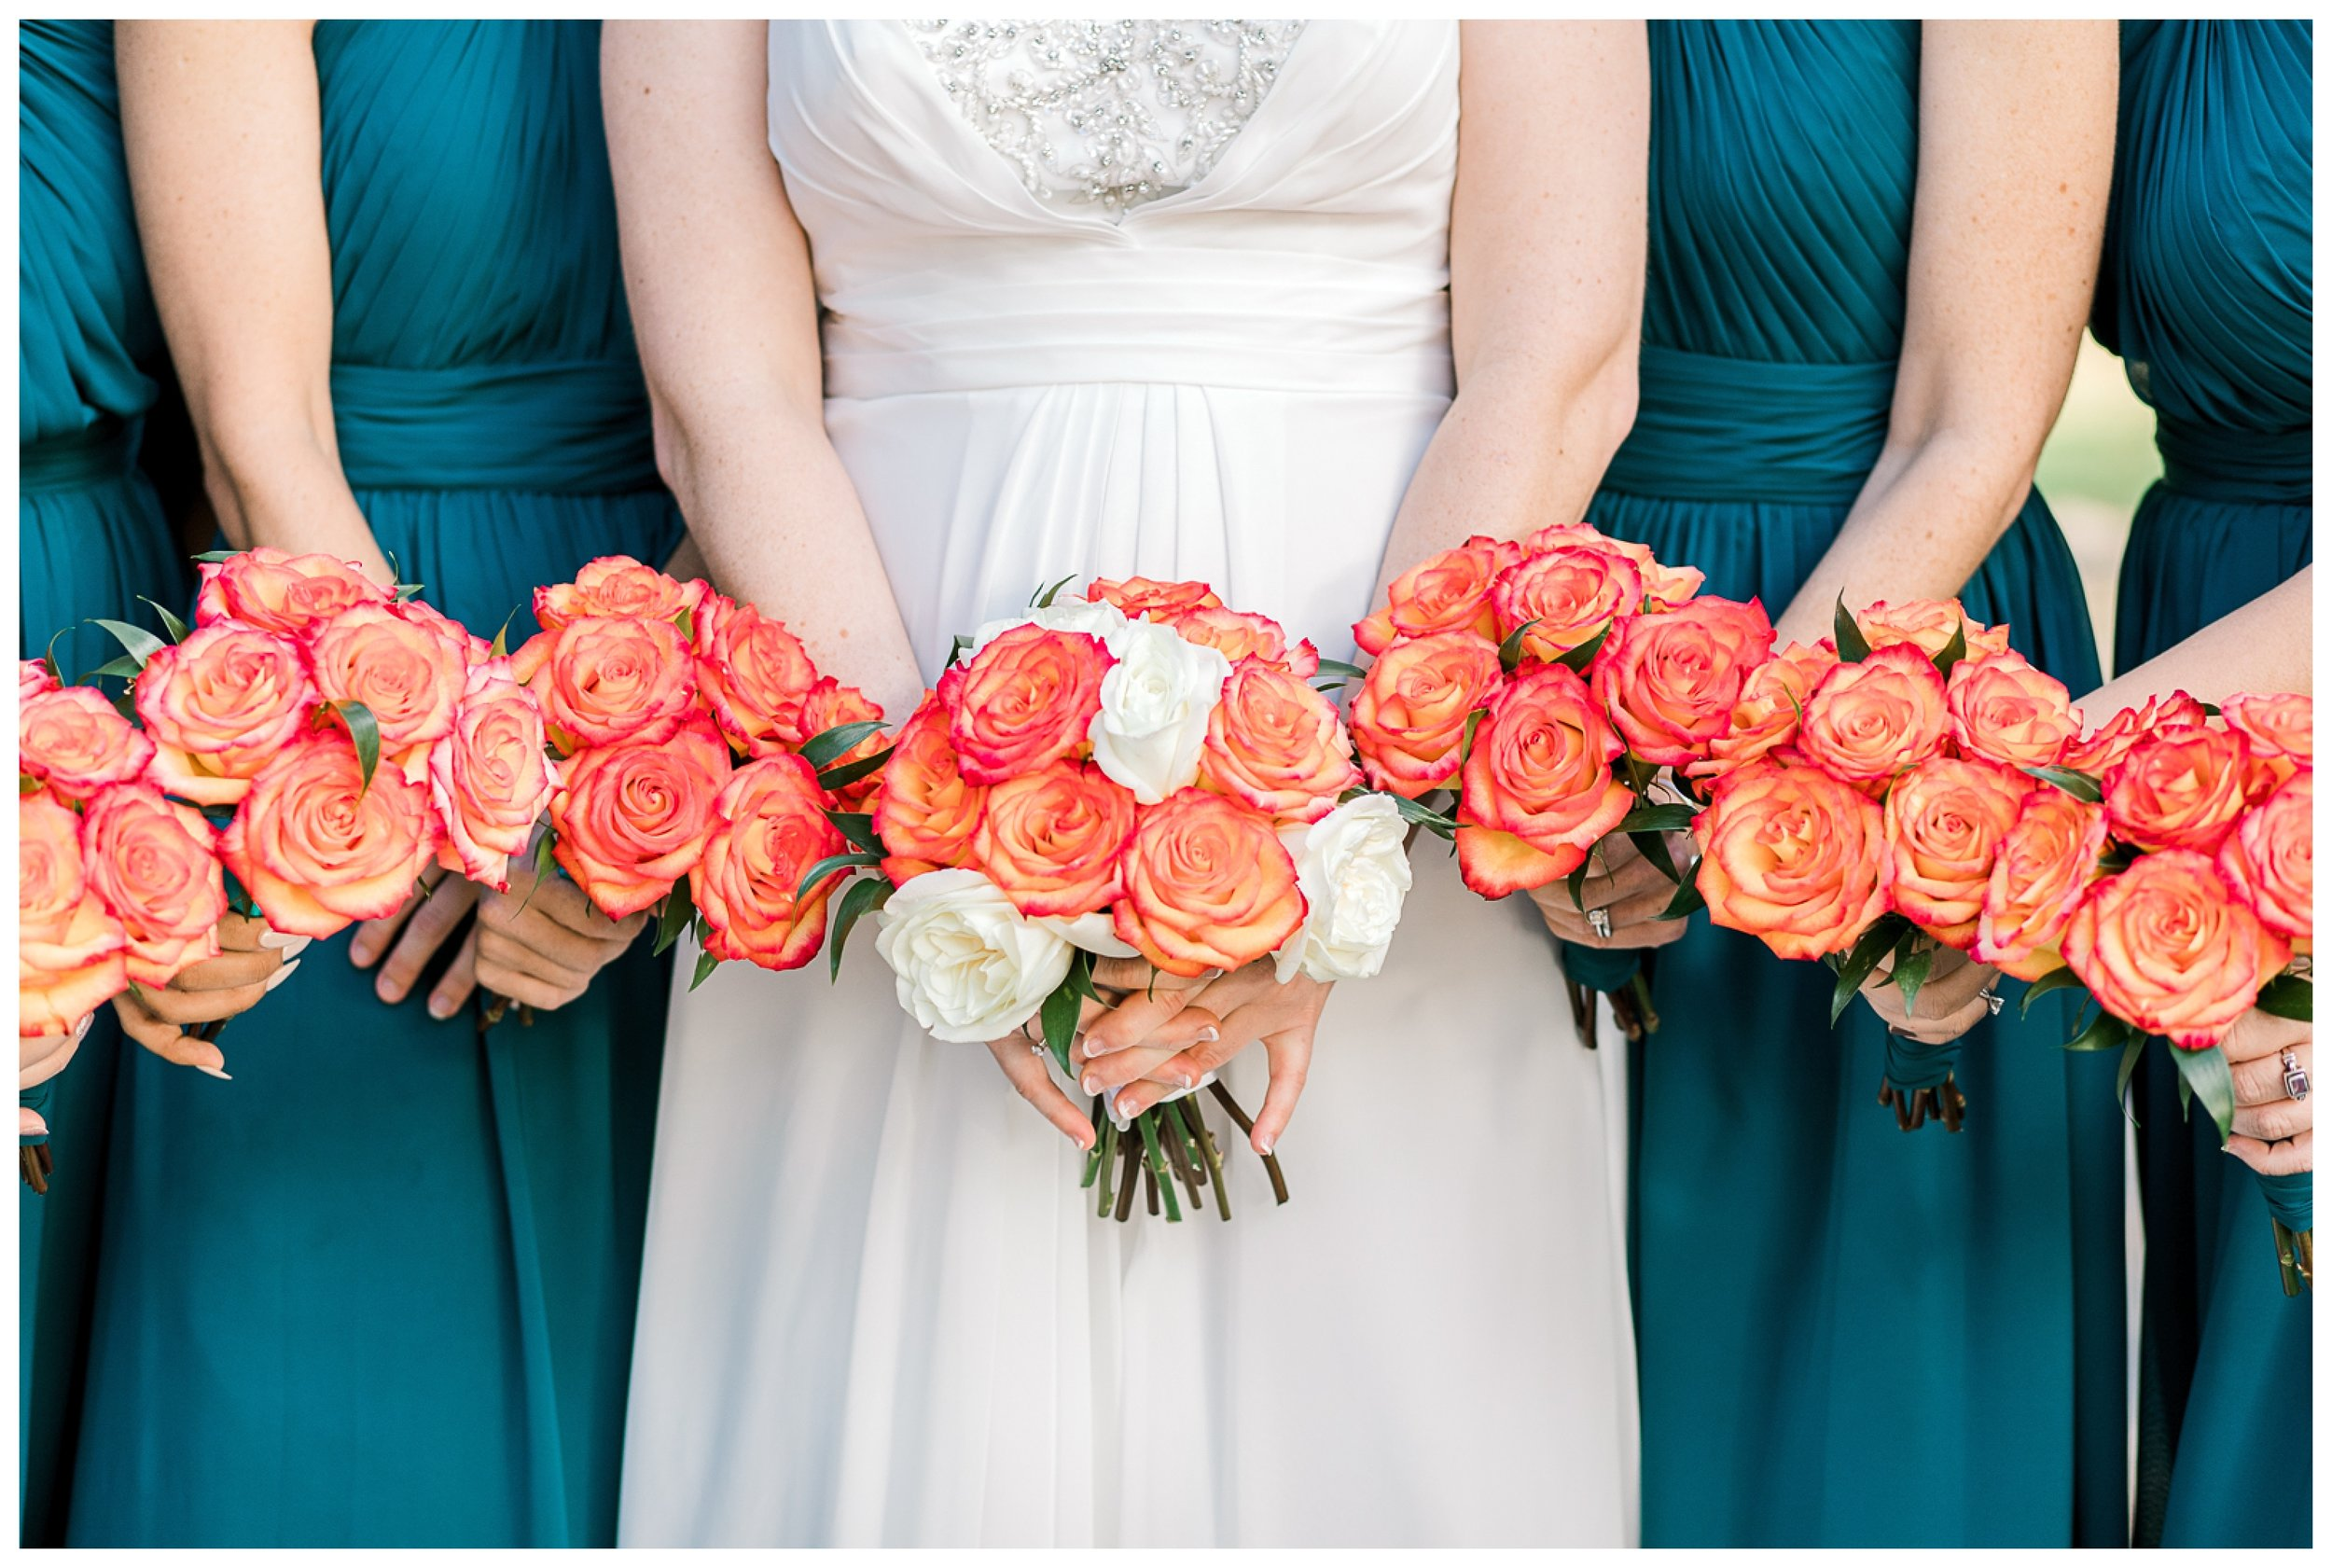 pleasant_valley_country_club_wedding_sutton_erica_pezente_photography (35).jpg